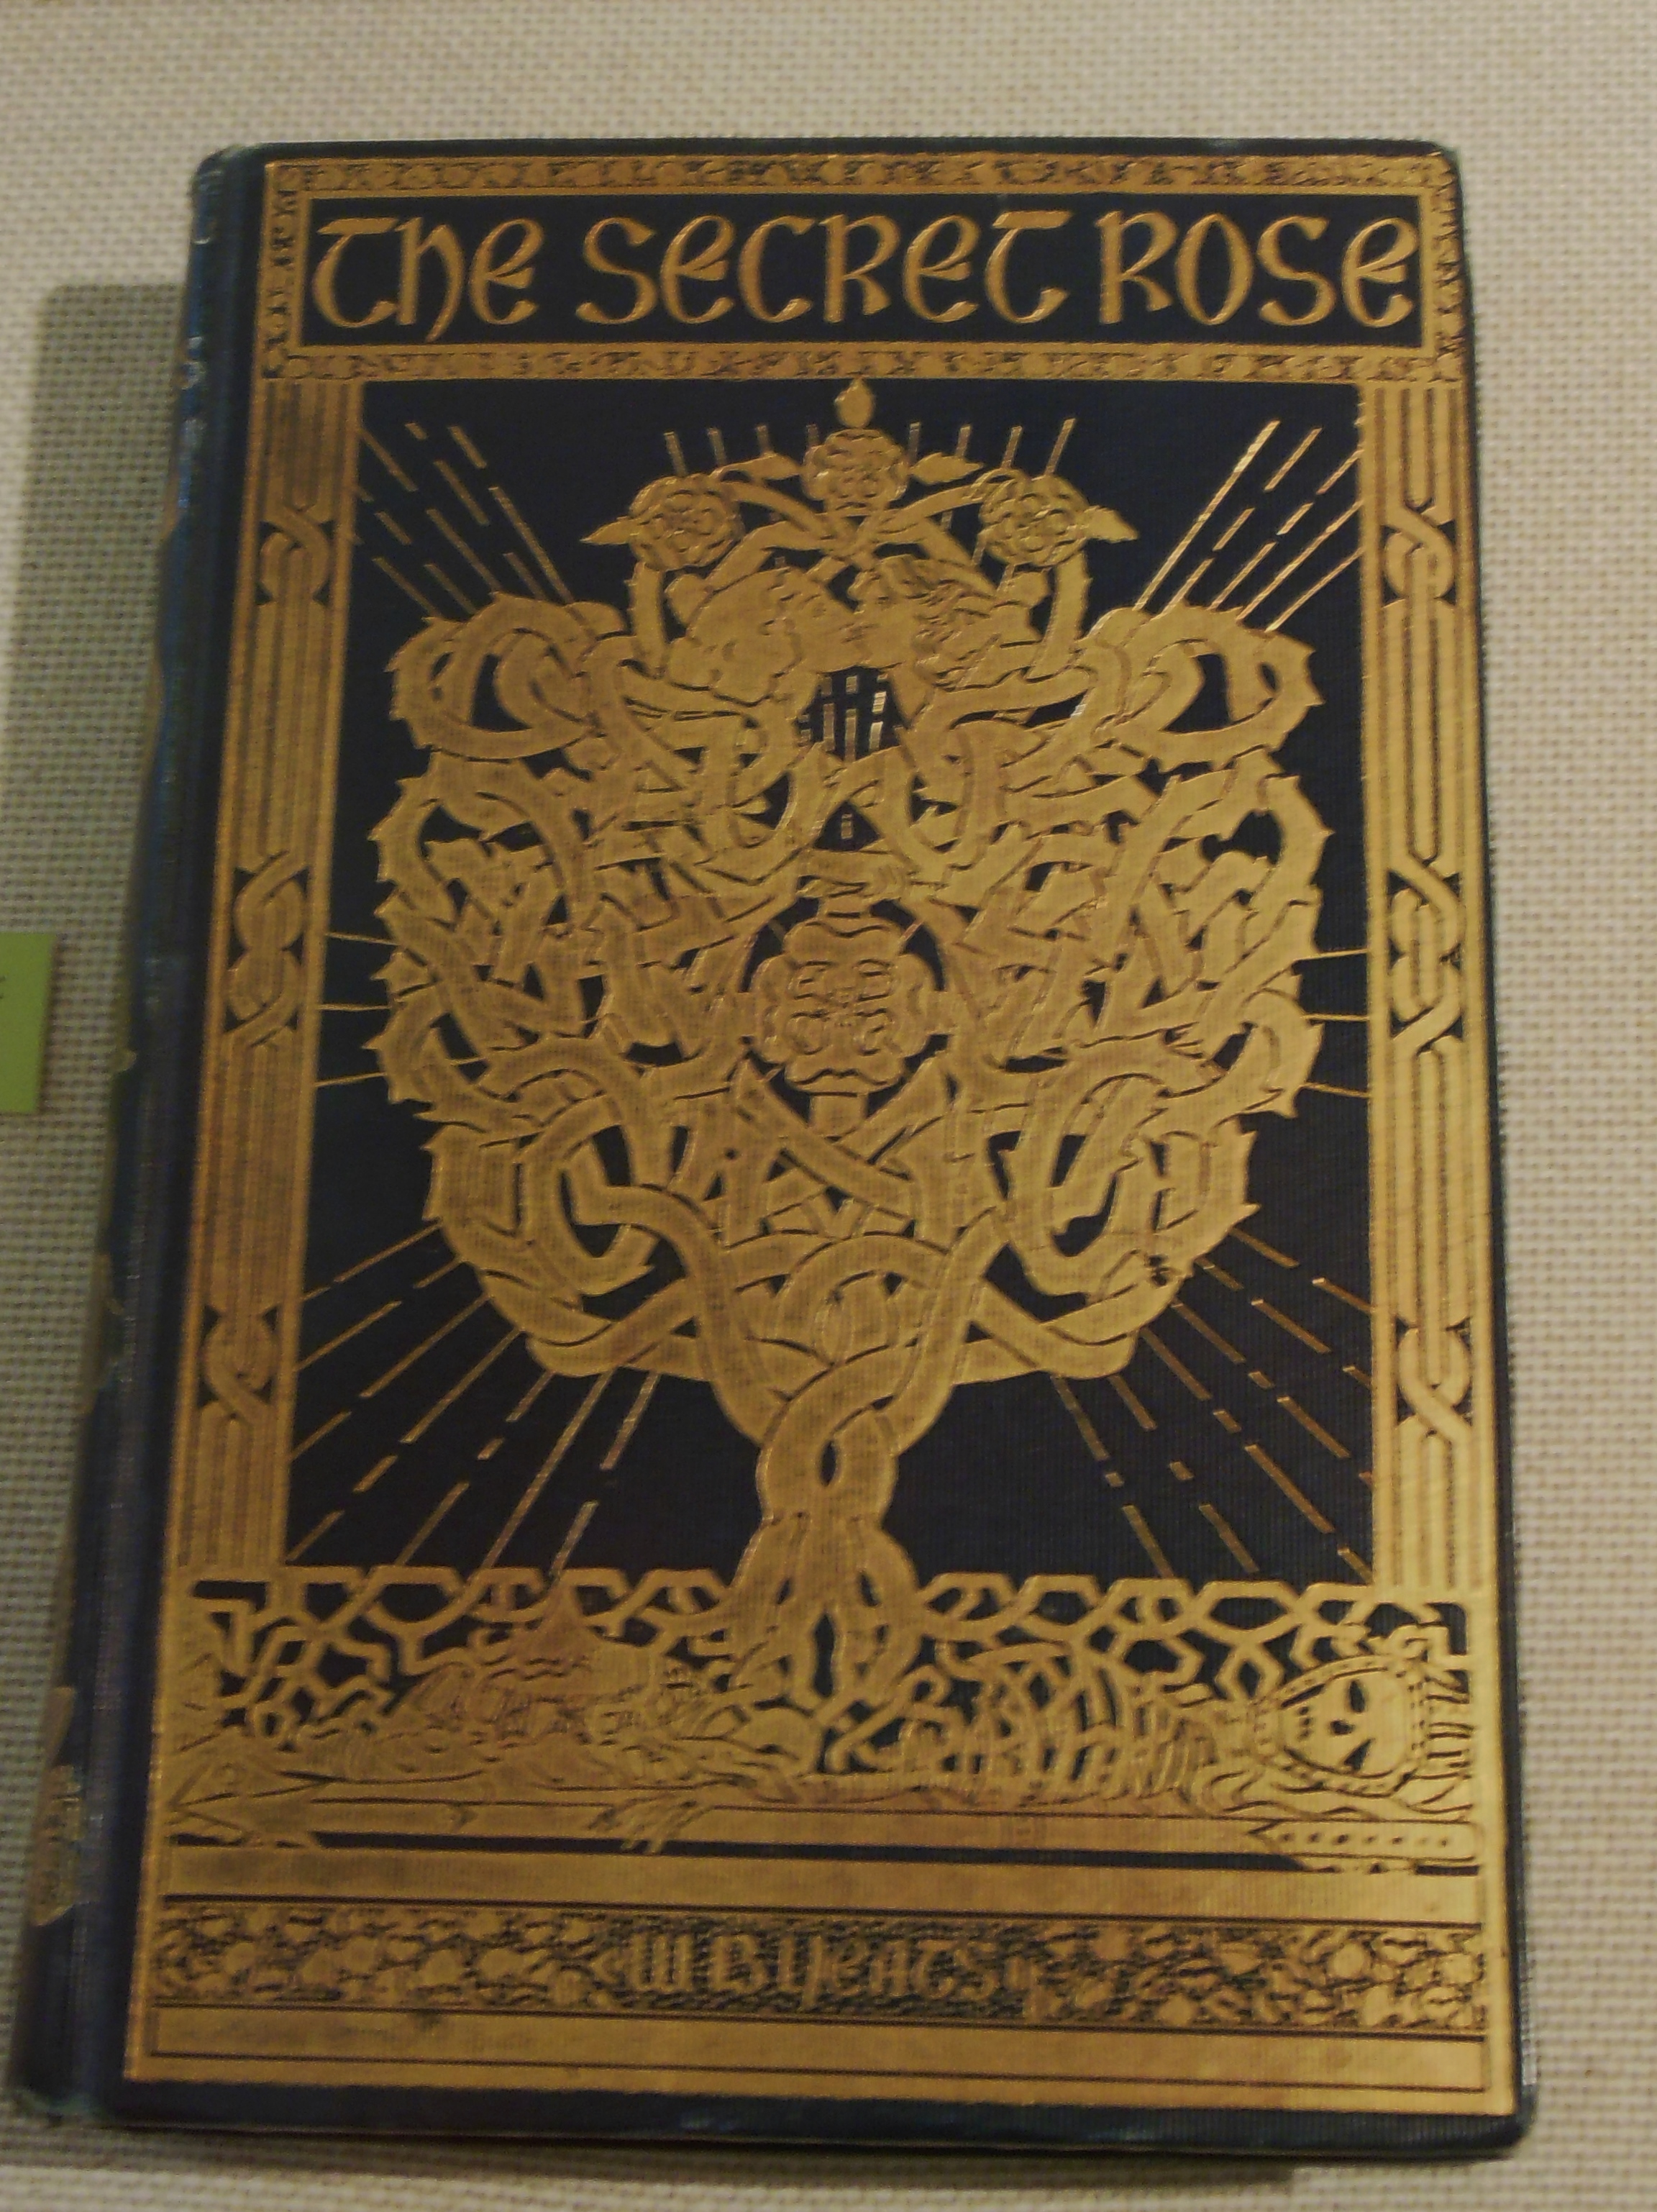 Early Irish literature